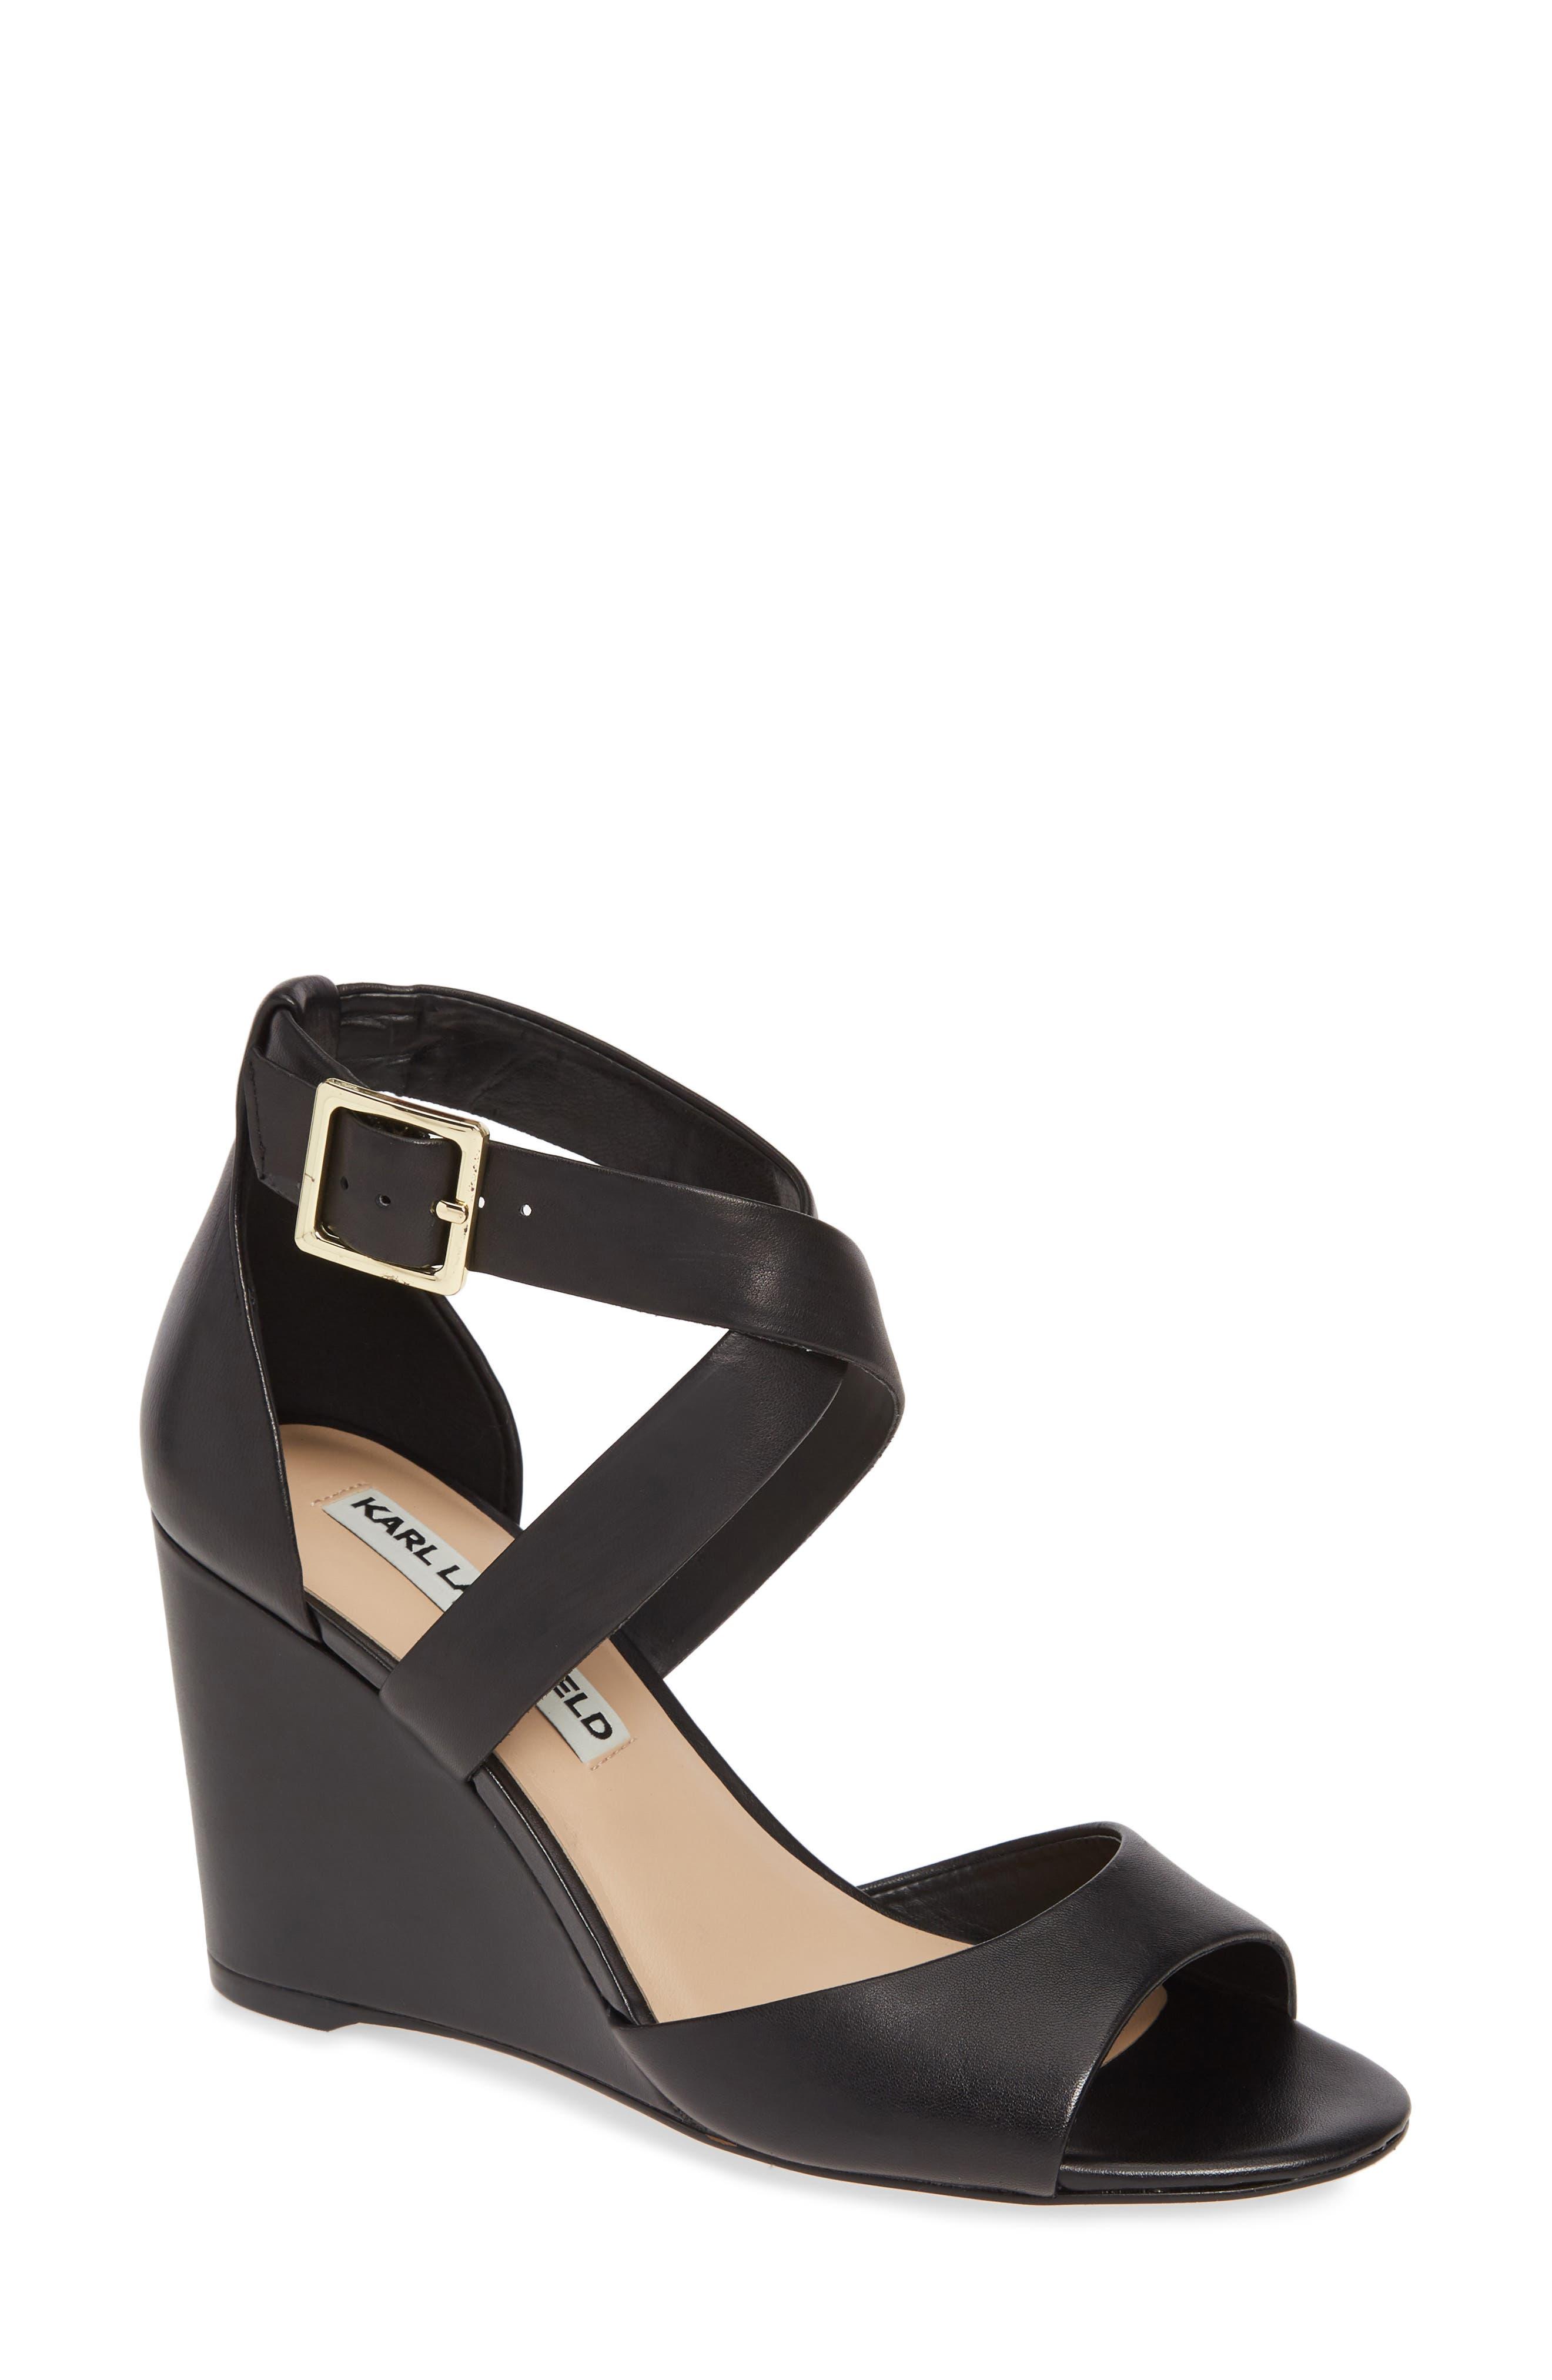 Karl Lagerfeld Paris Radka Wedge Sandal- Black